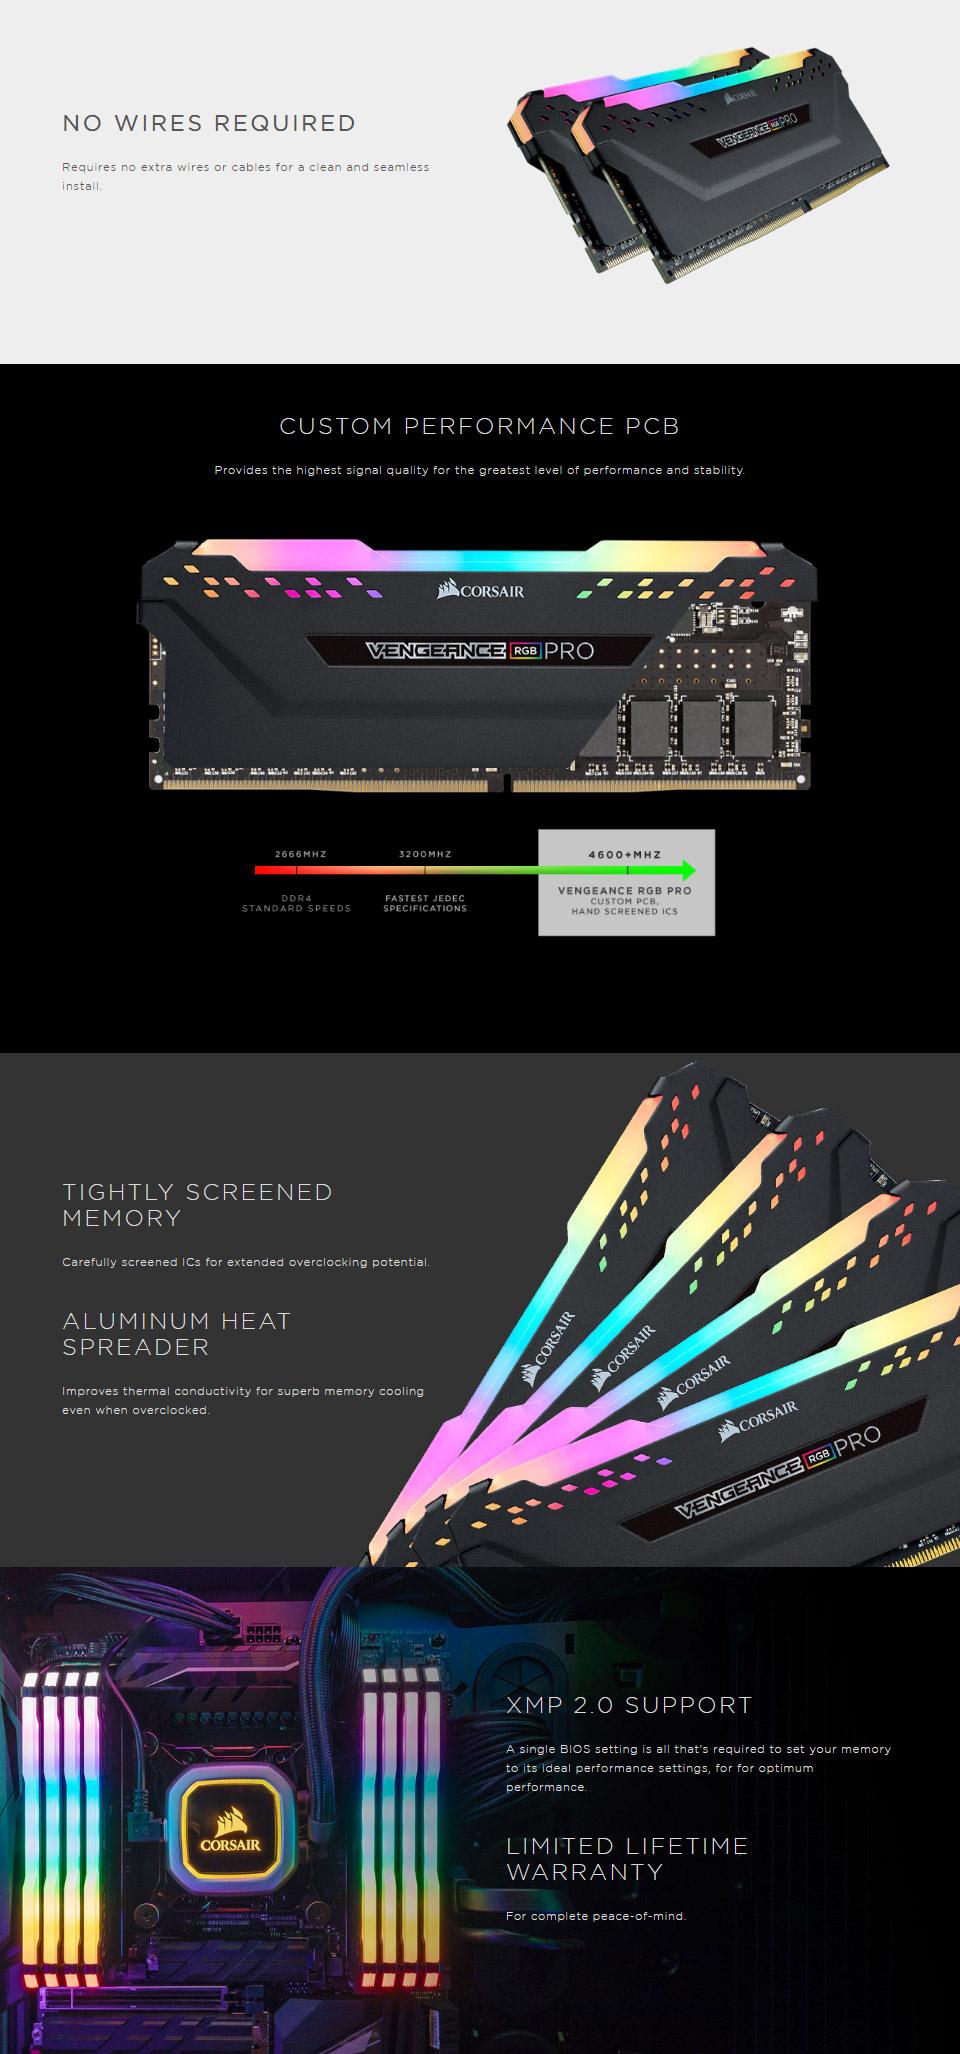 Corsair Vengeance RGB Pro CMW16GX4M2C3200C16 16GB (2x8GB) DDR4